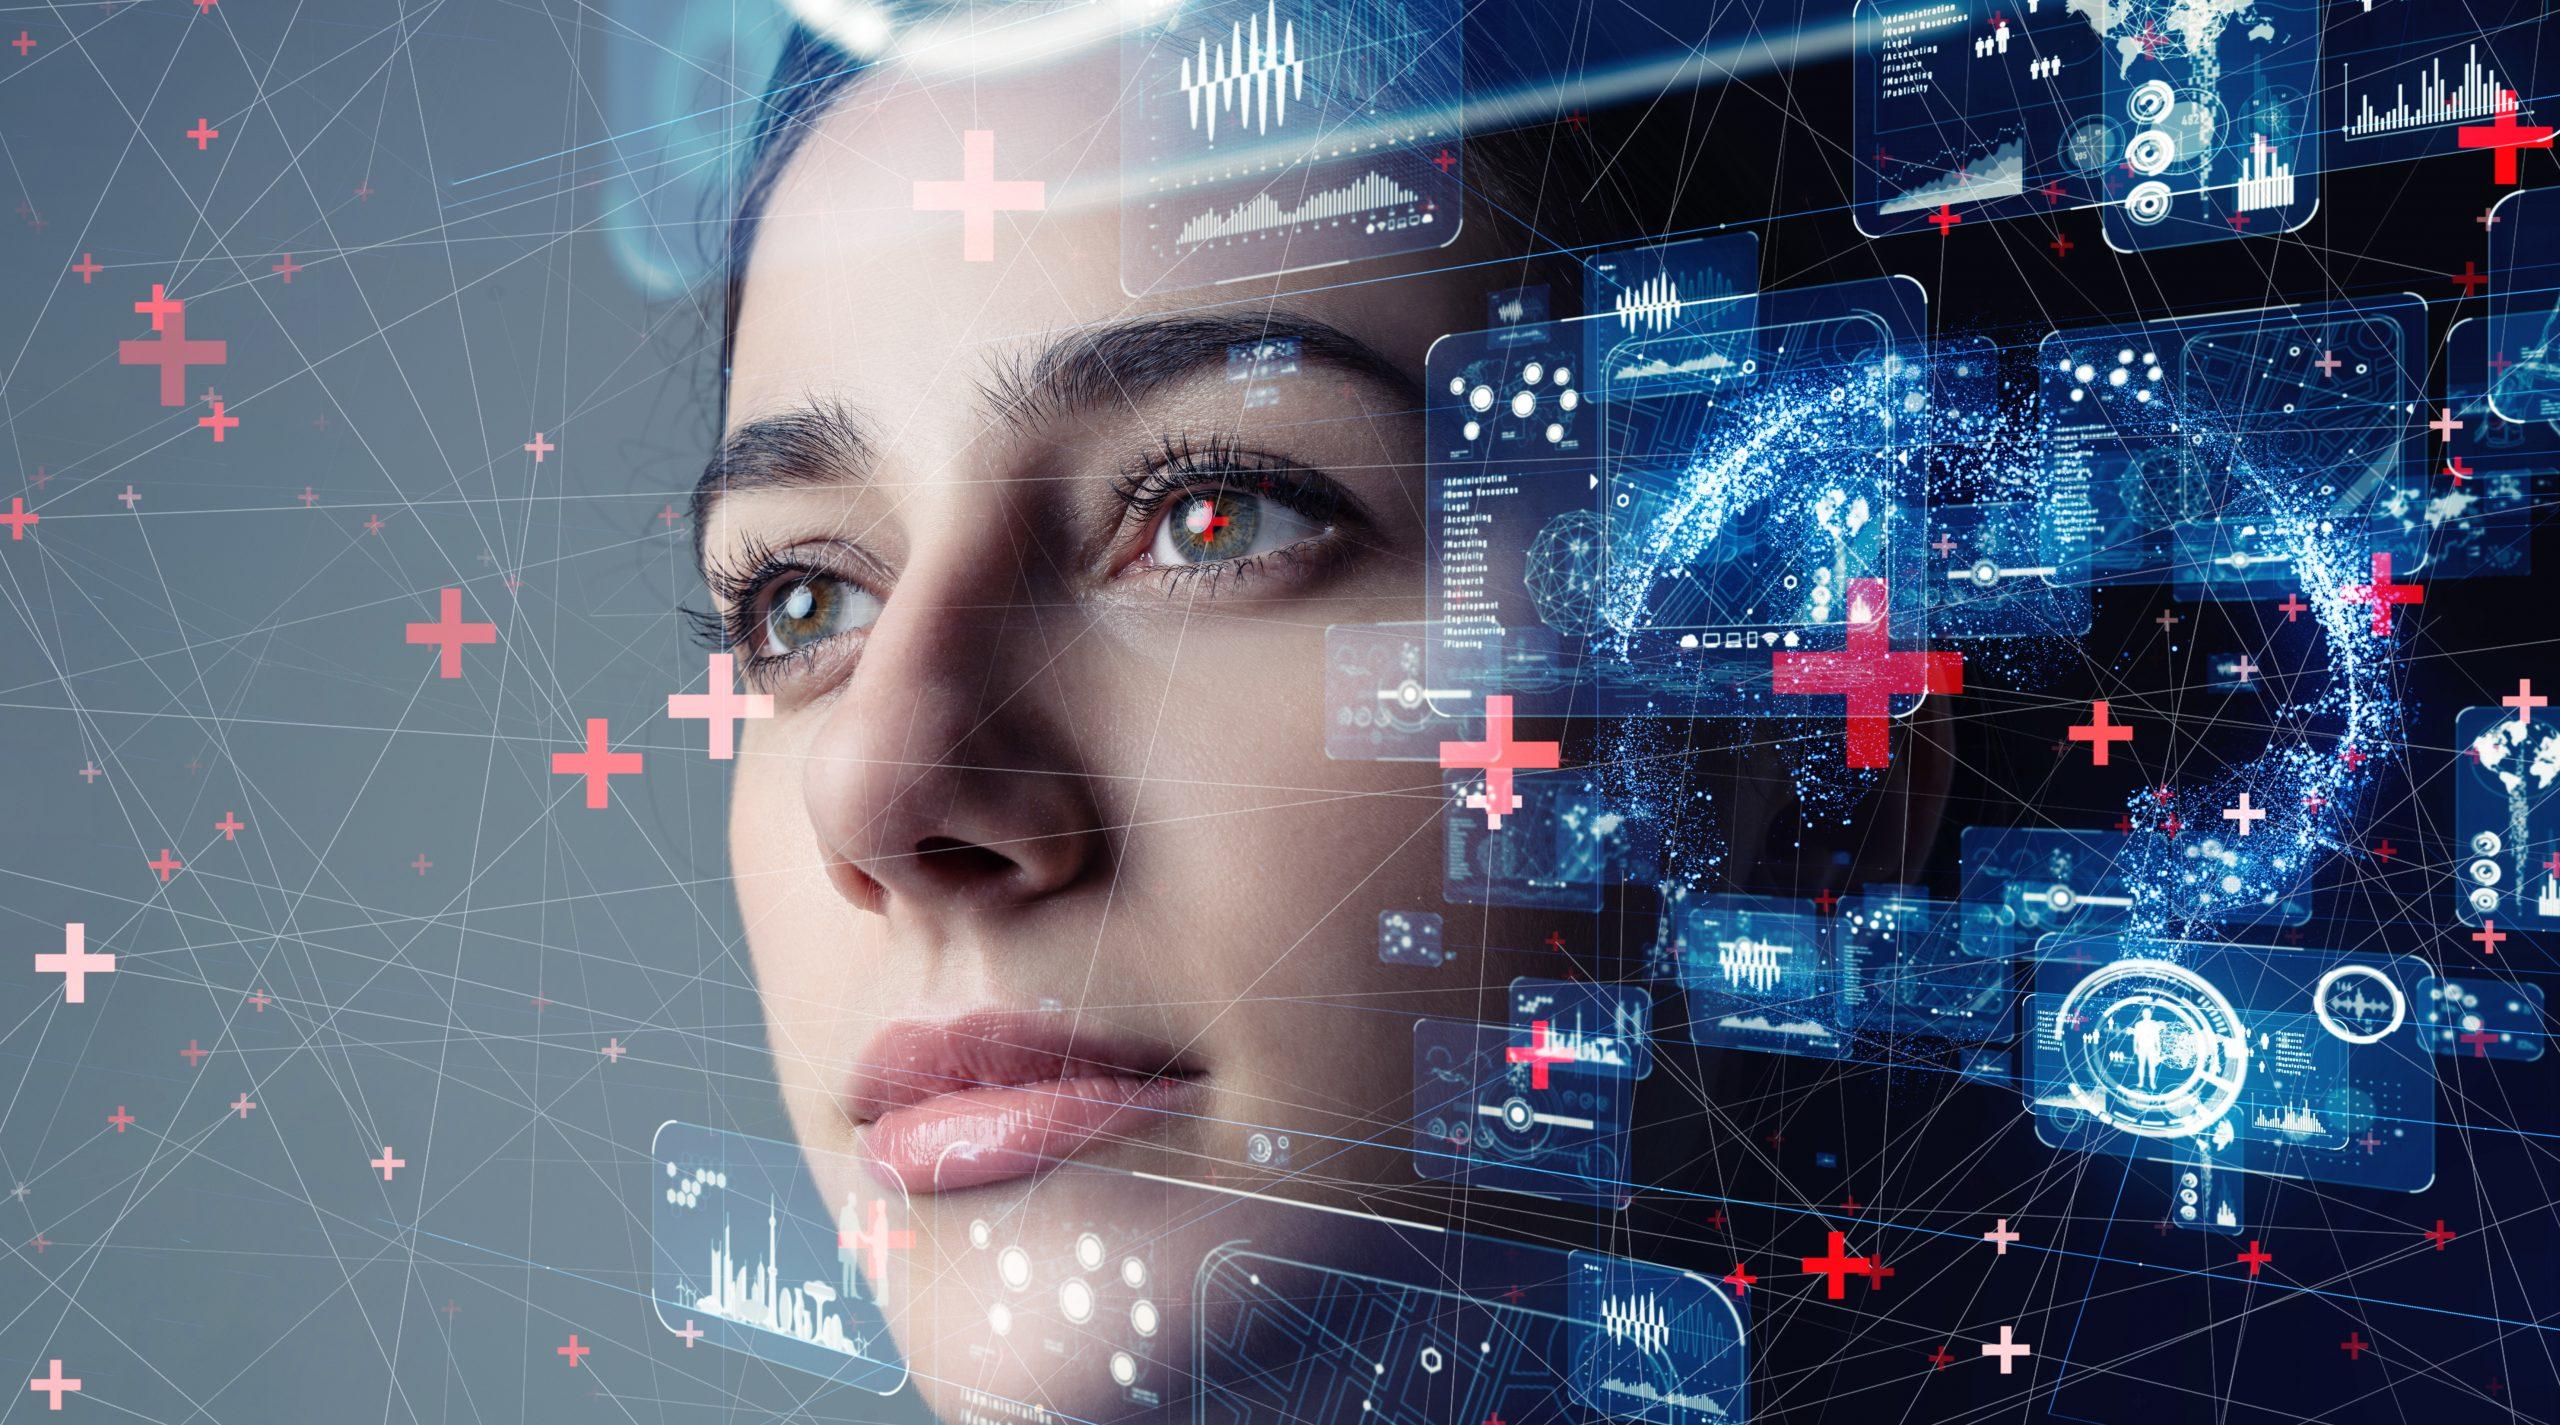 Eye-tracking vs Predictive Eye-tracking